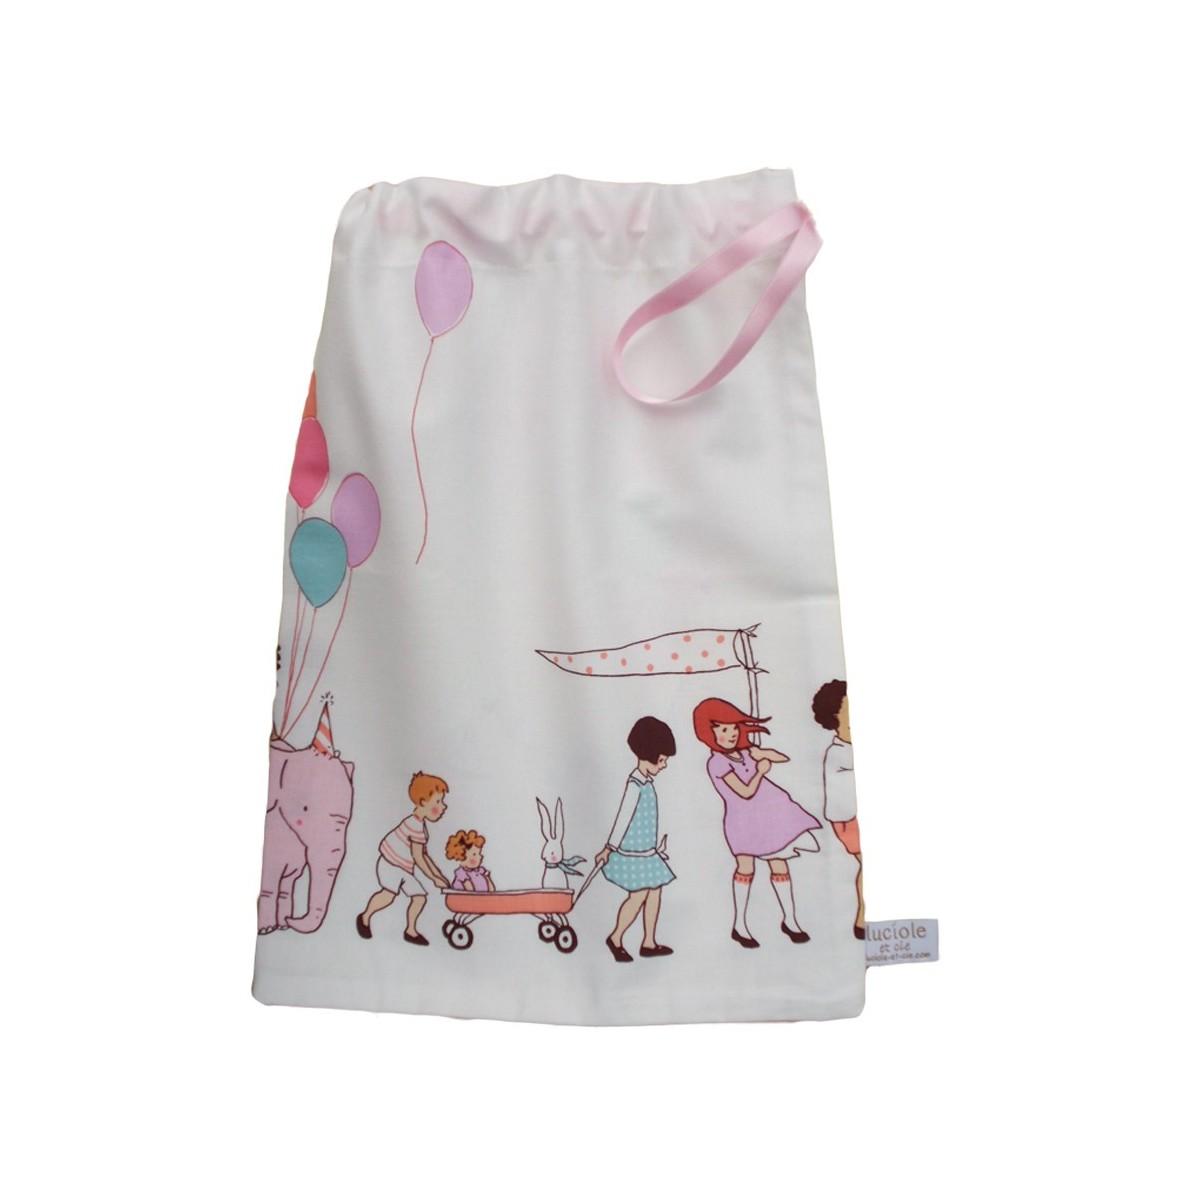 petit sac en coton parade ecole maternelle. Black Bedroom Furniture Sets. Home Design Ideas